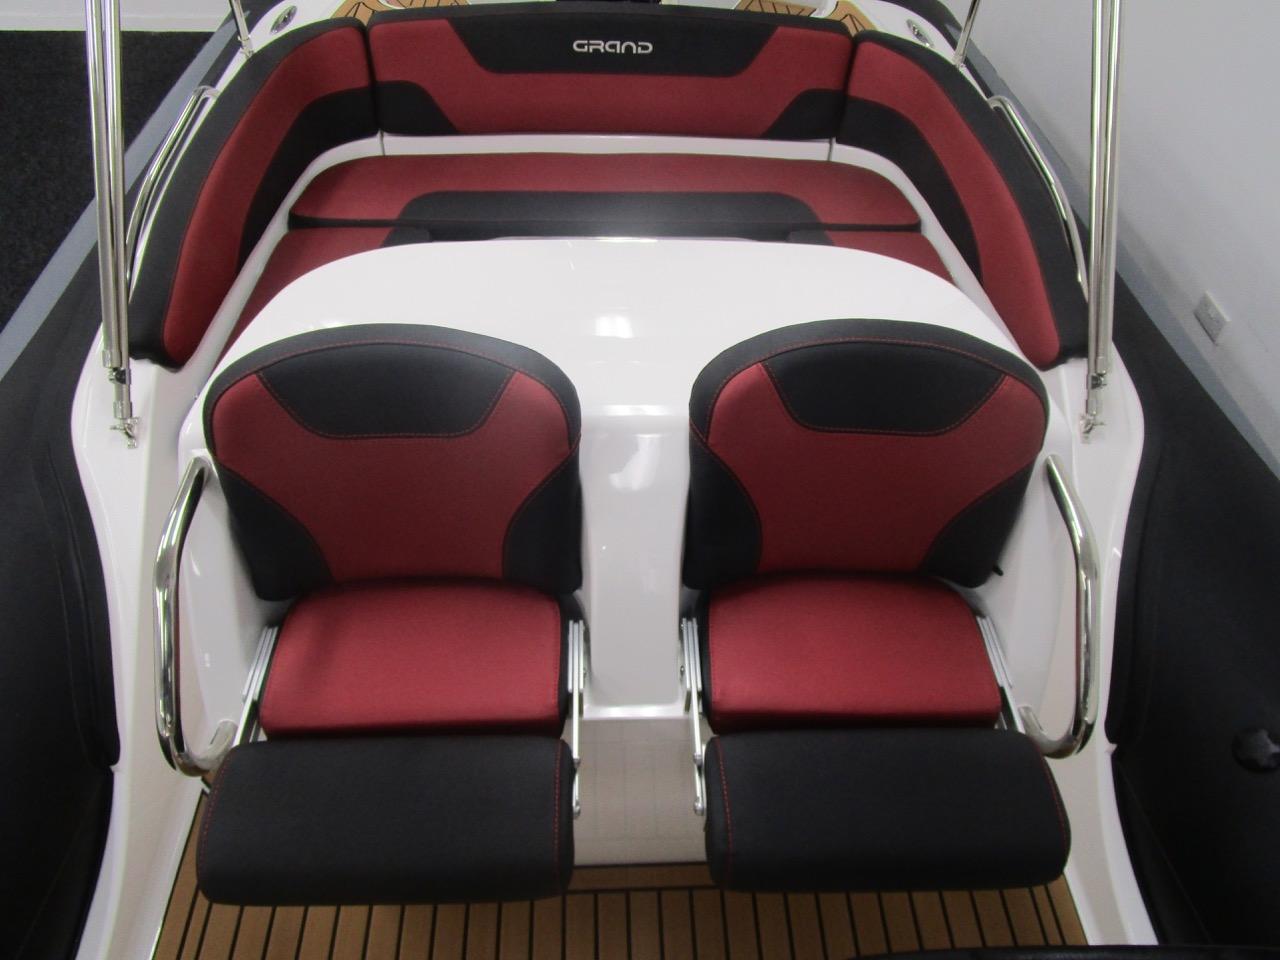 GRAND G850 RIB secure helm seats